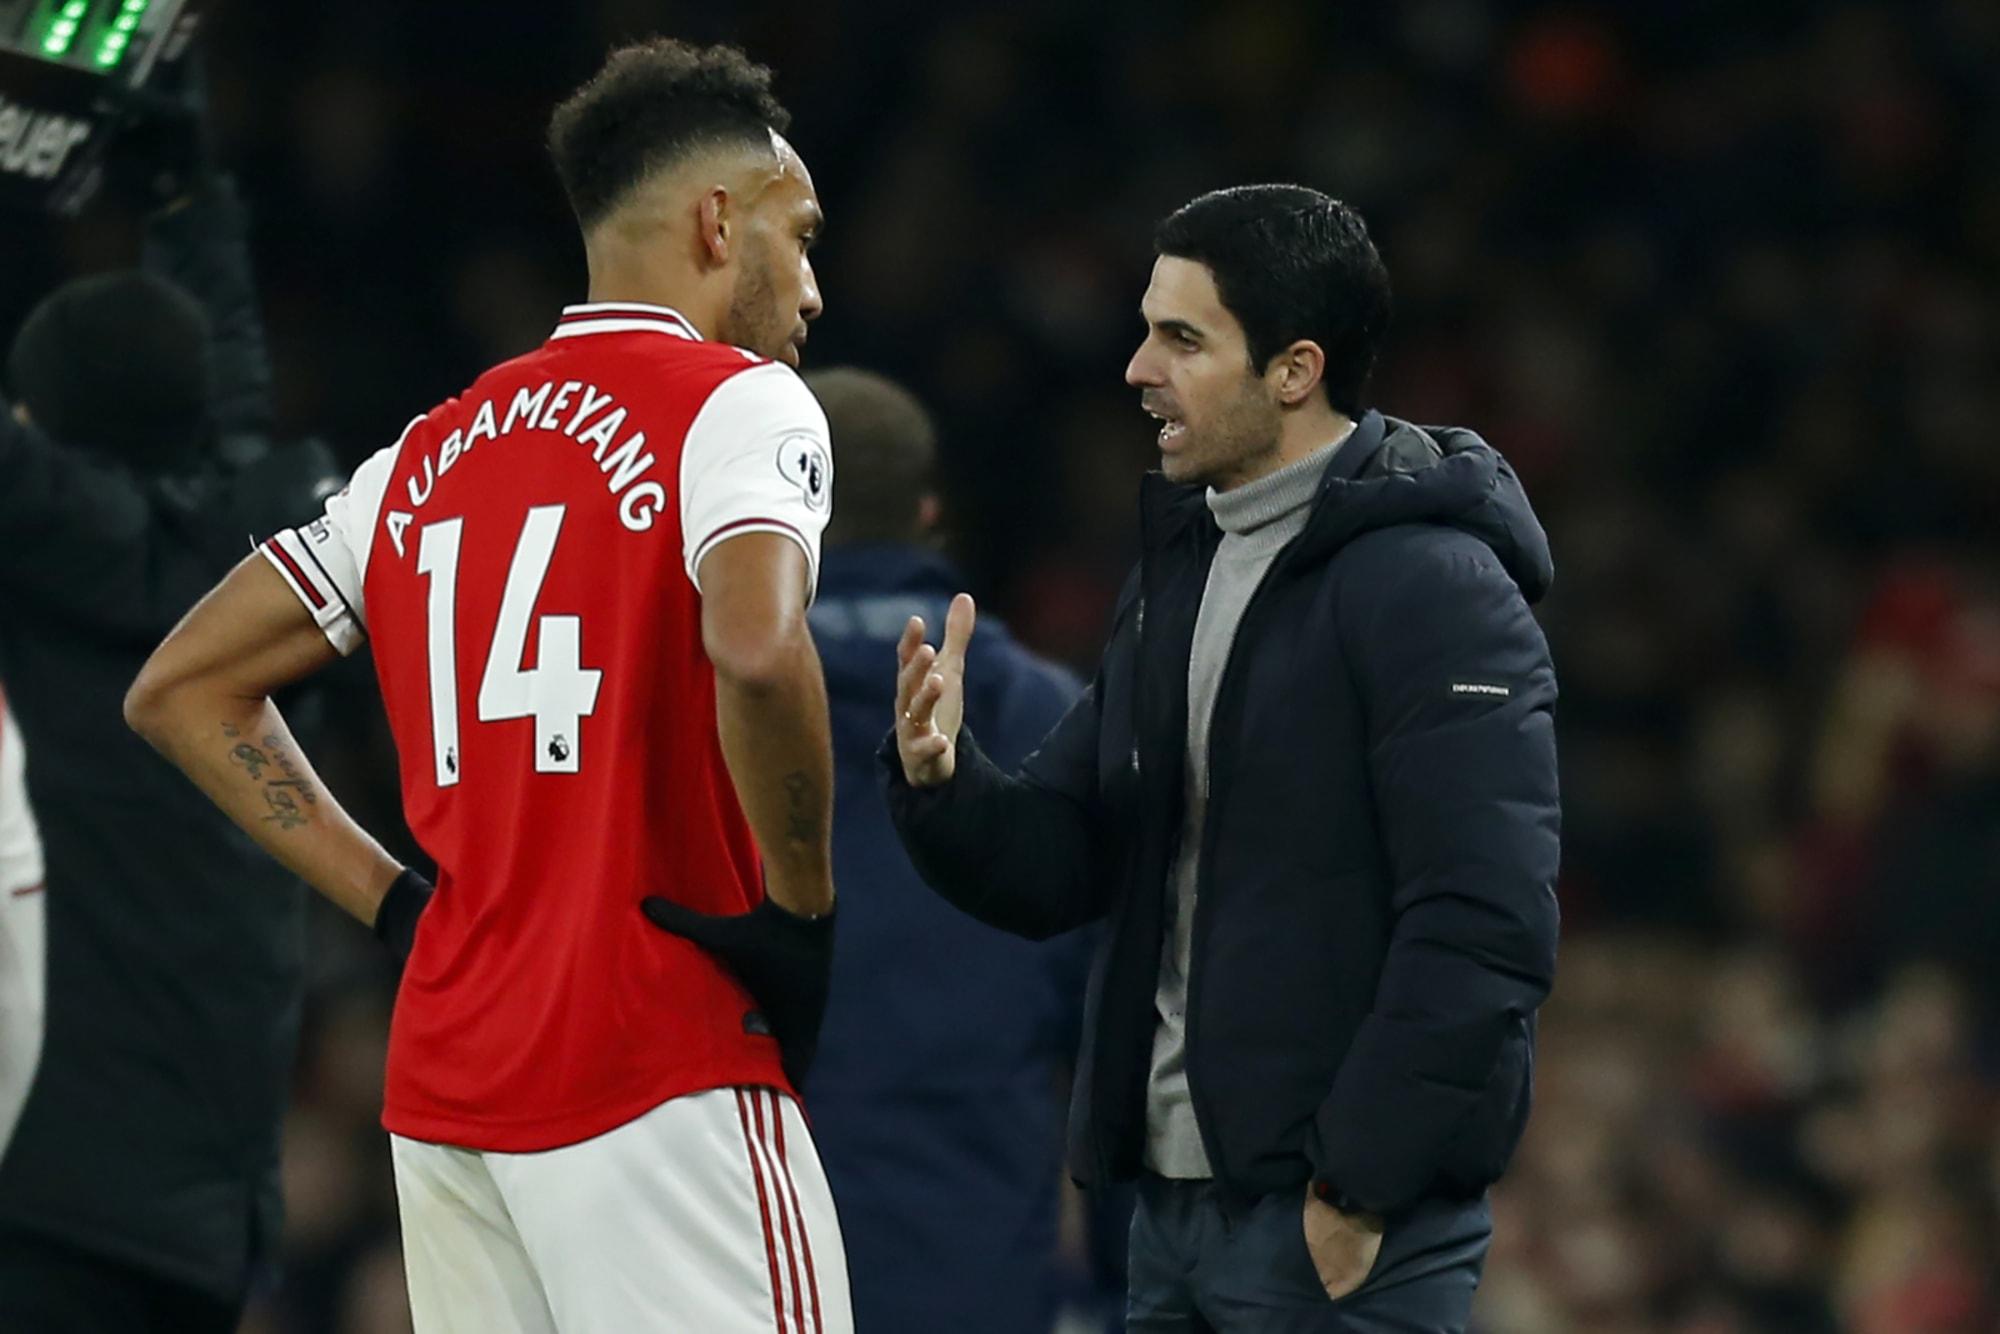 Arsenal: 3 problems if Pierre-Emerick Aubameyang stays